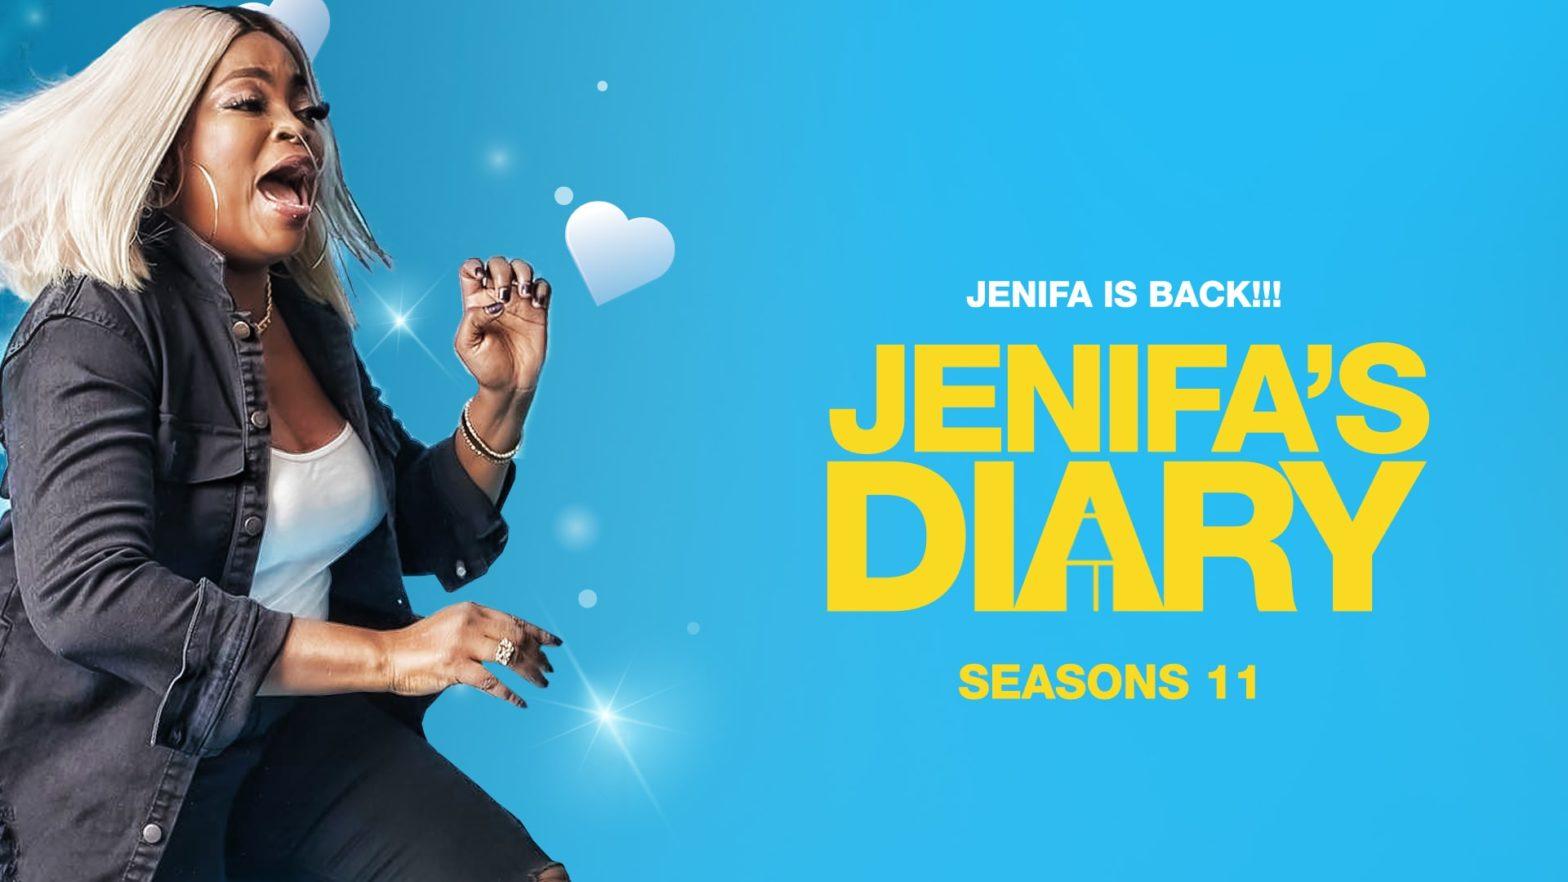 Jenifas Diary